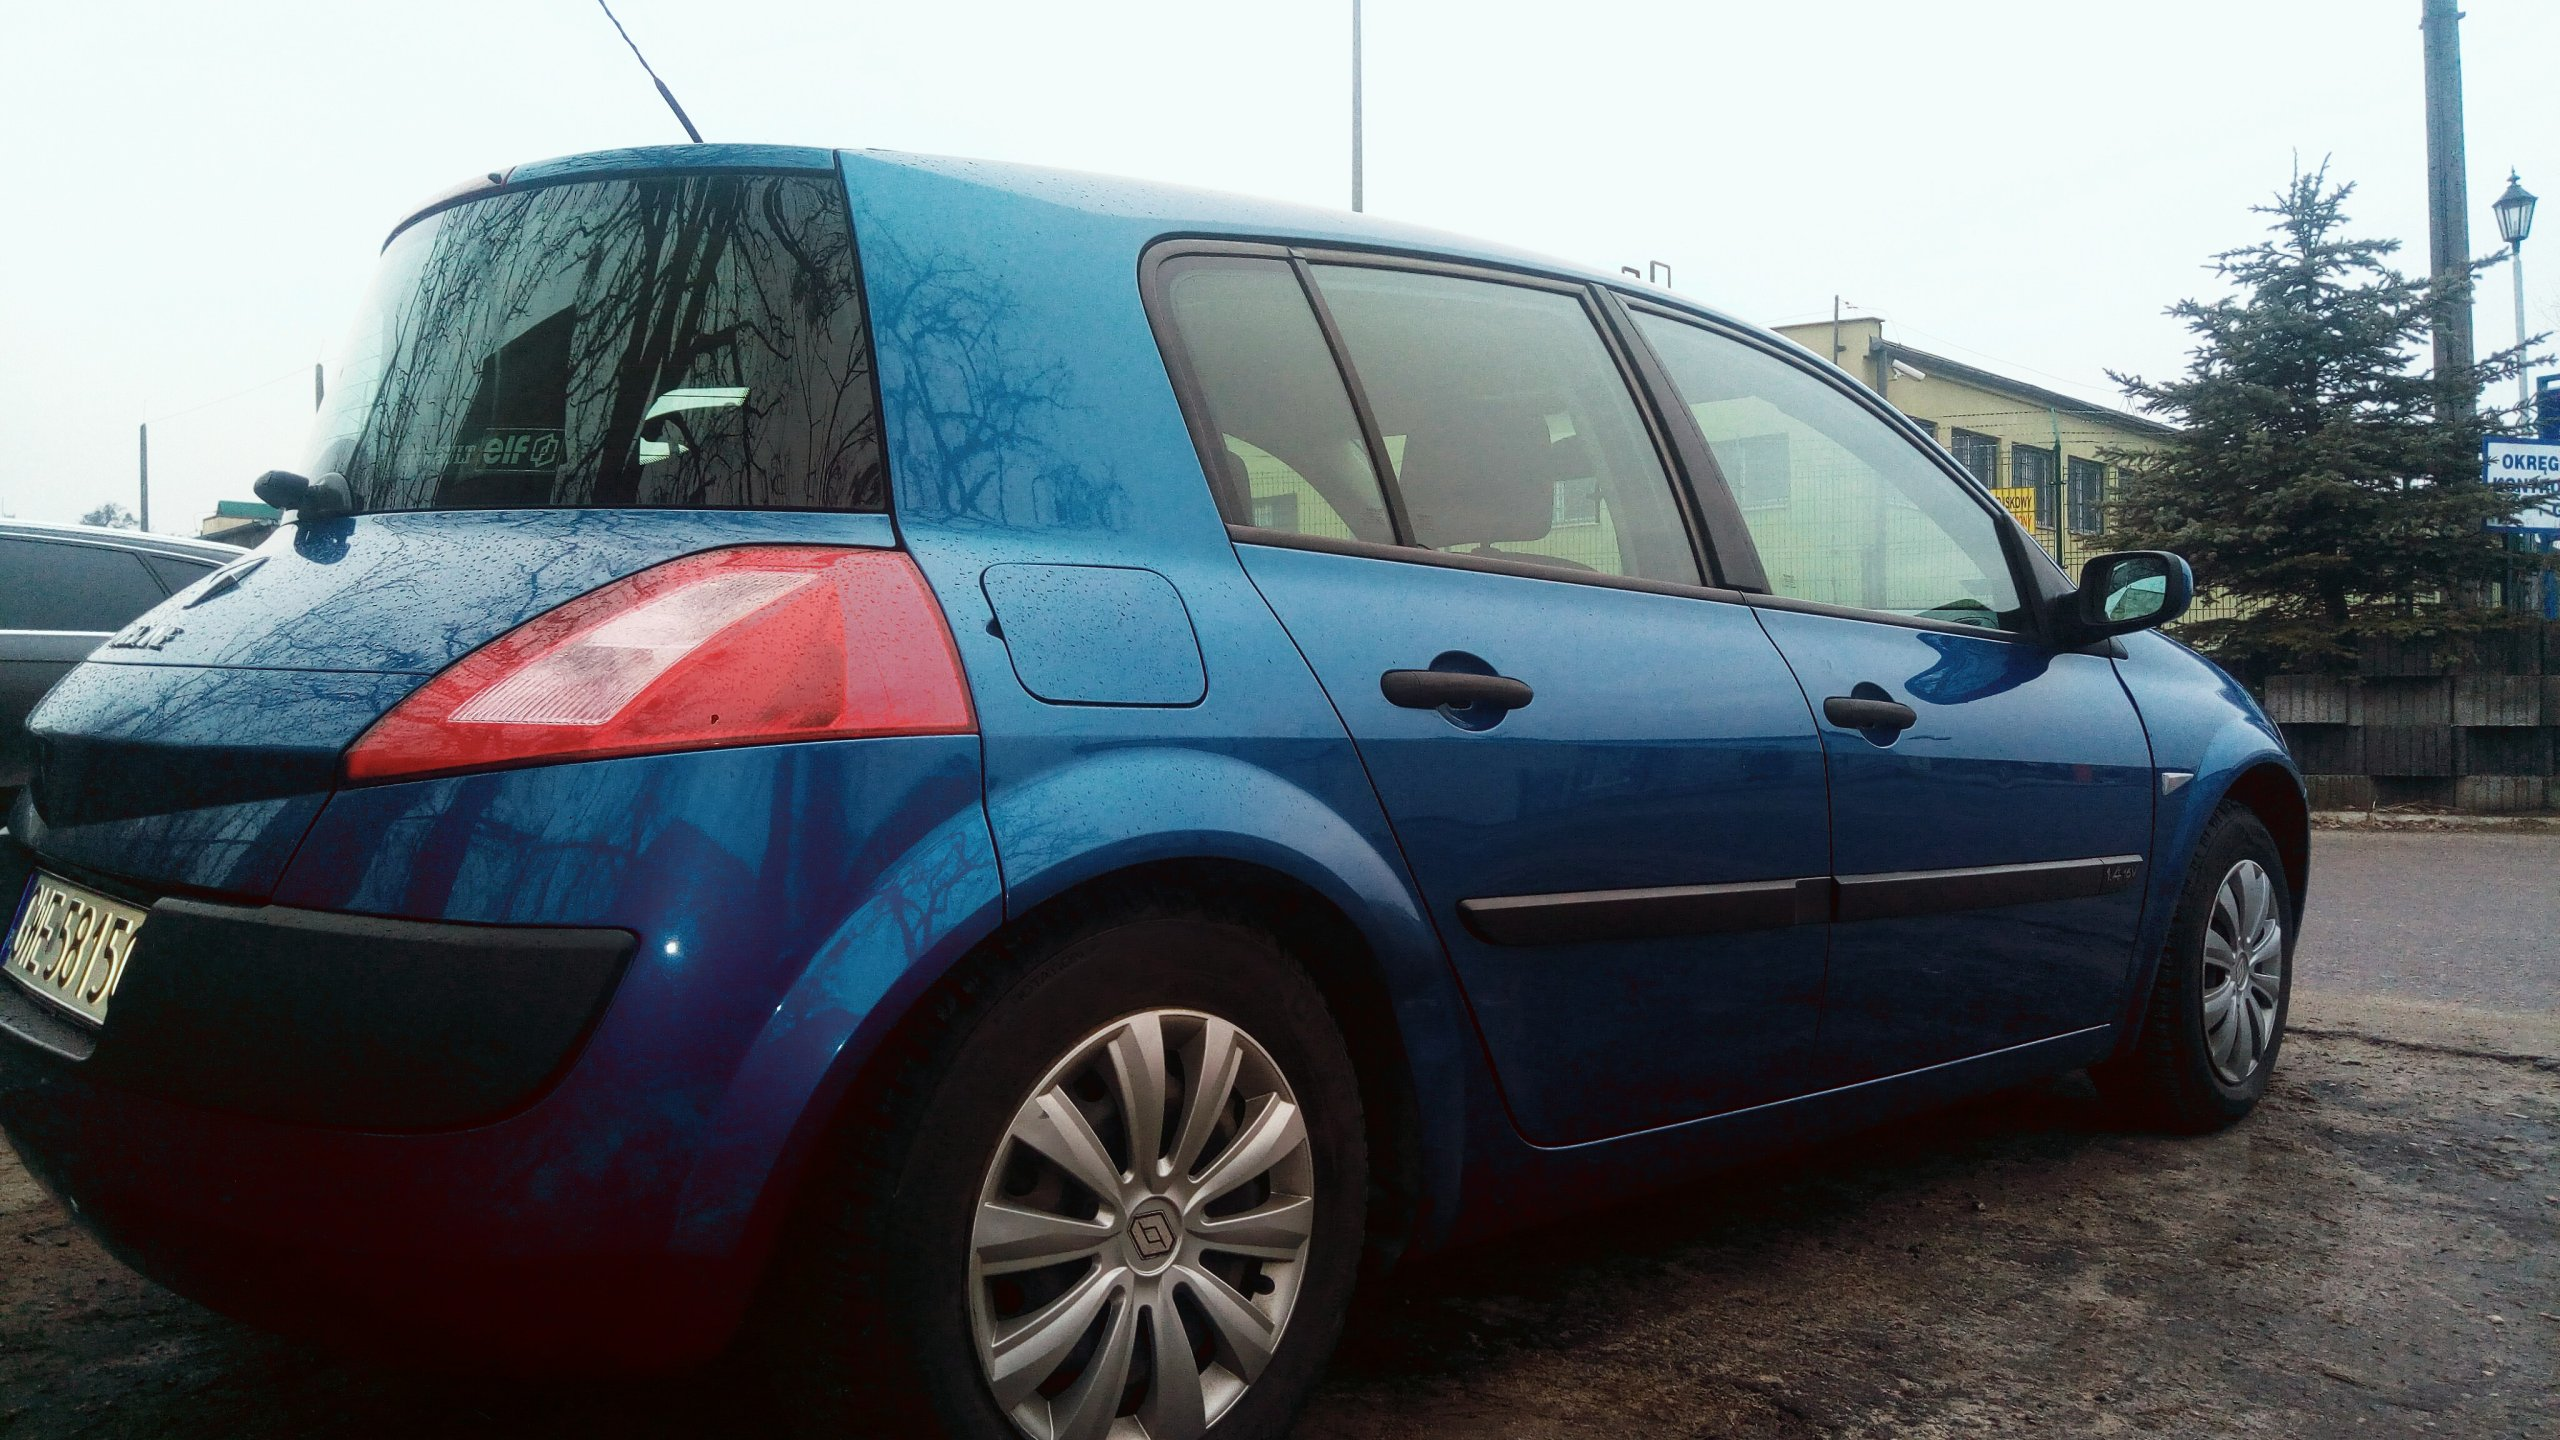 Renault Megane Ii 14 16v Lpg 2kpl Opon 7233077947